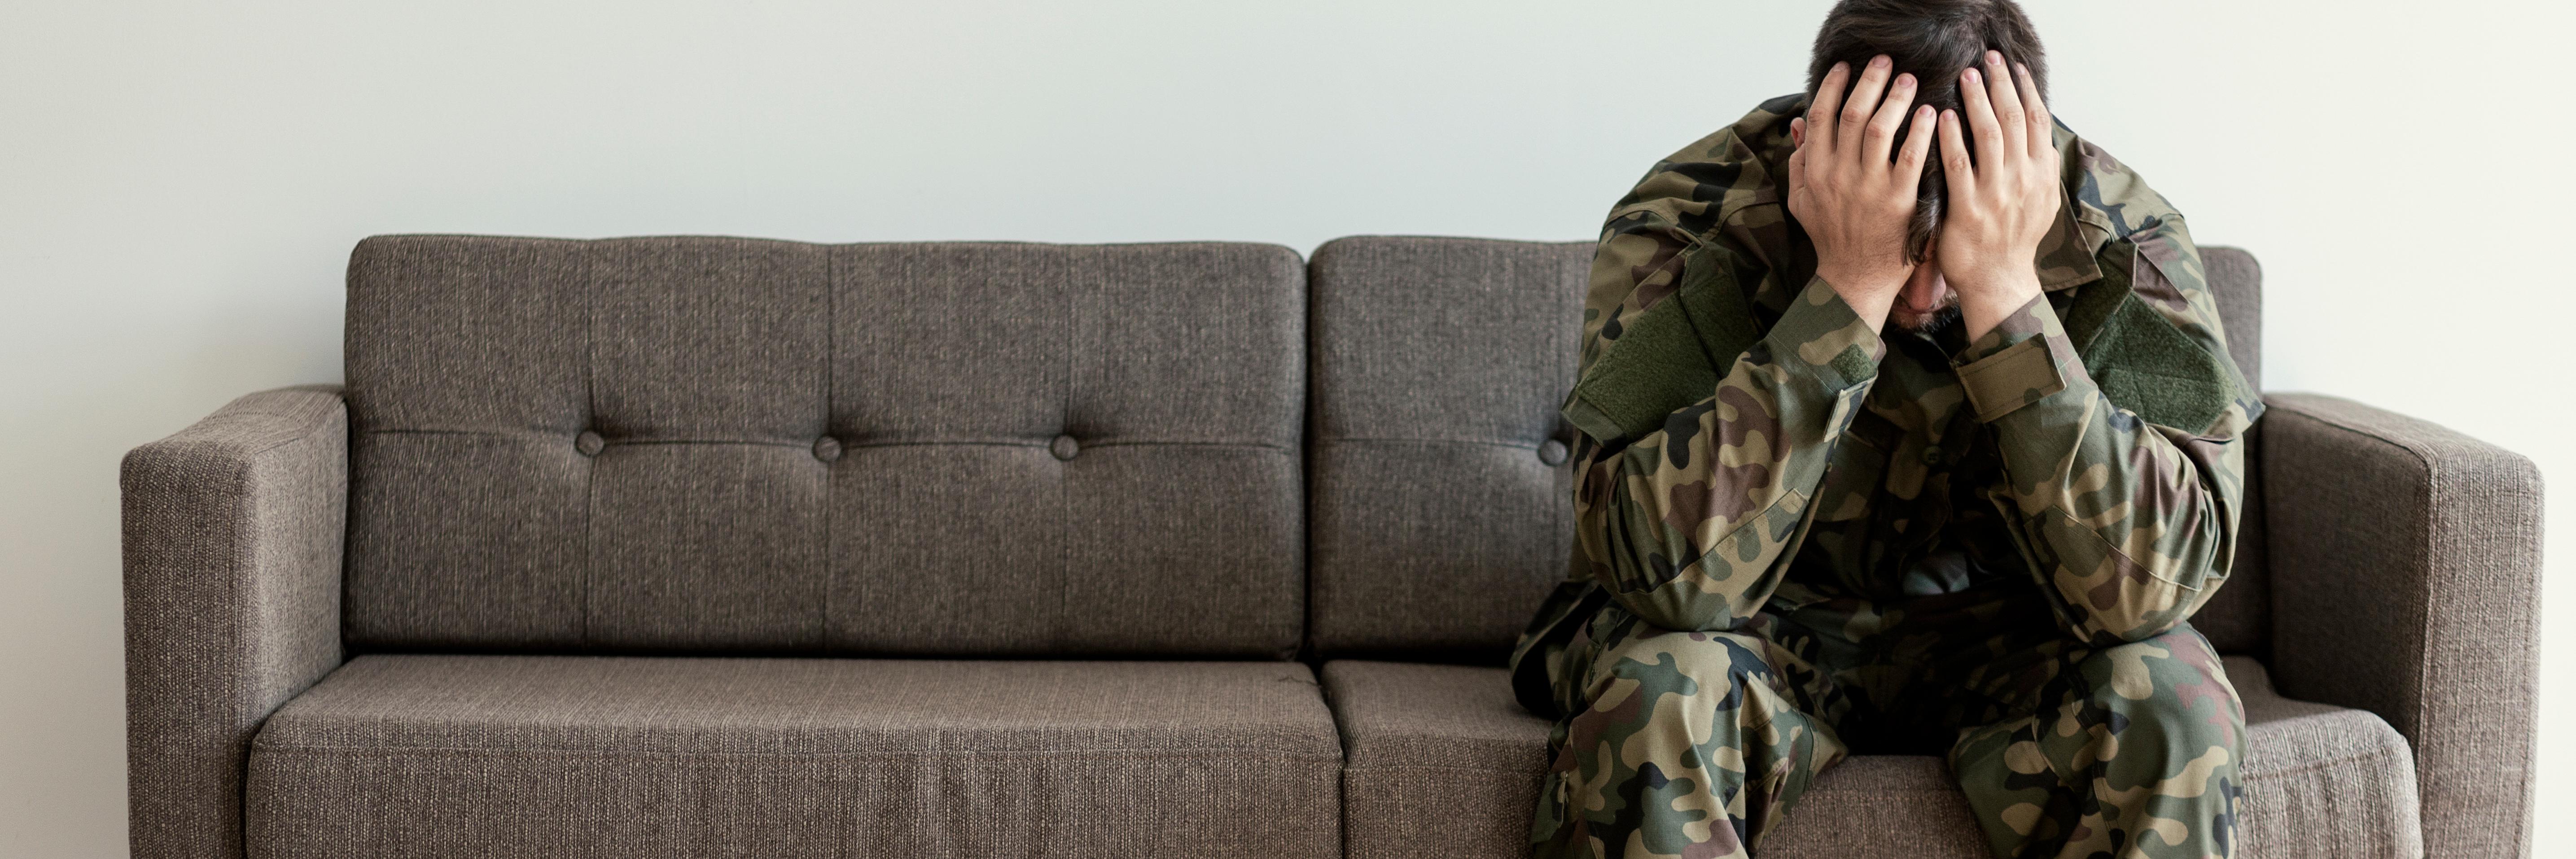 shutterstock- military- sad- ptsd